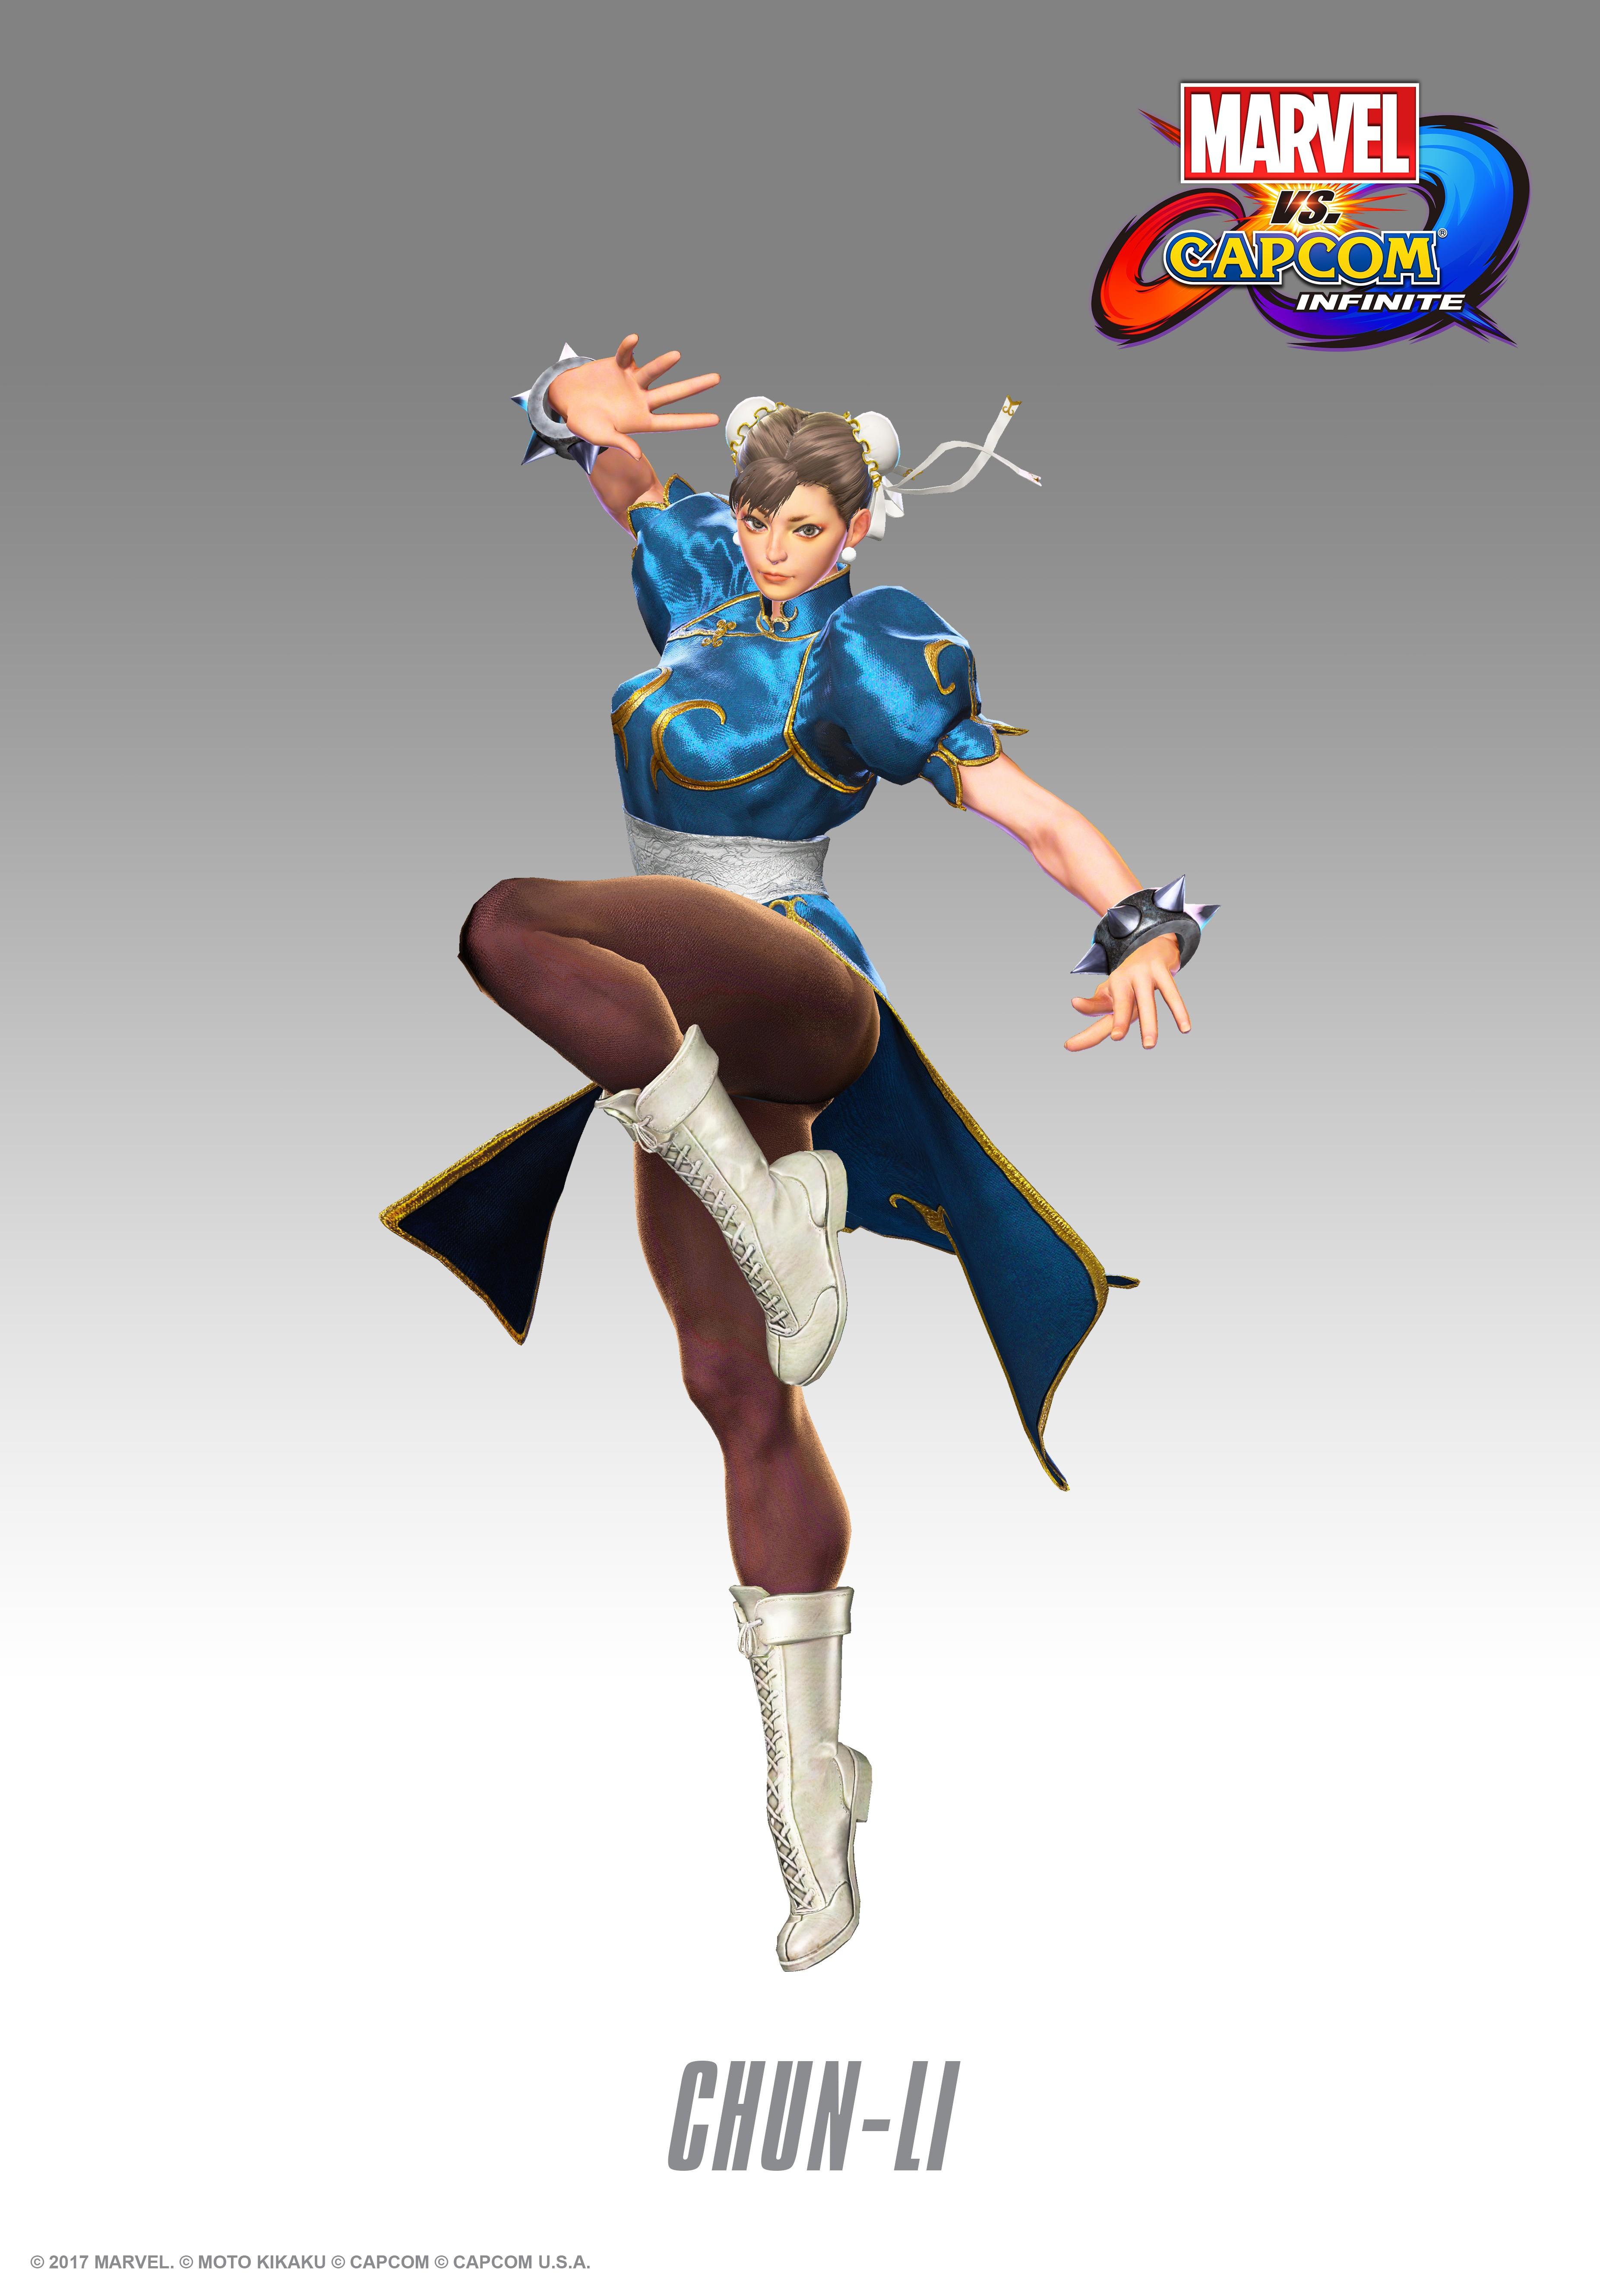 Чунь Ли - Marvel vs. Capcom: Infinite Арт, Персонаж